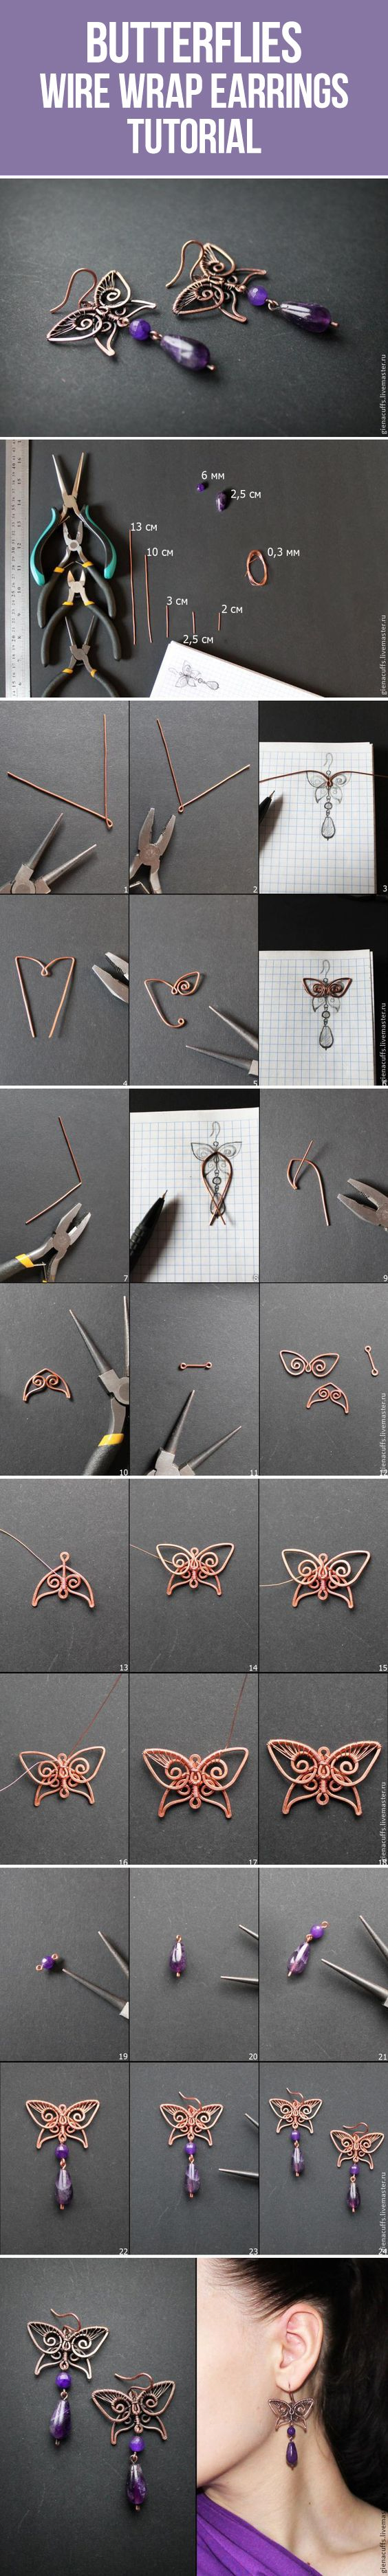 Wire wrap earrings tutorial / Серьги из медной проволоки и аметиста, мастер-класс